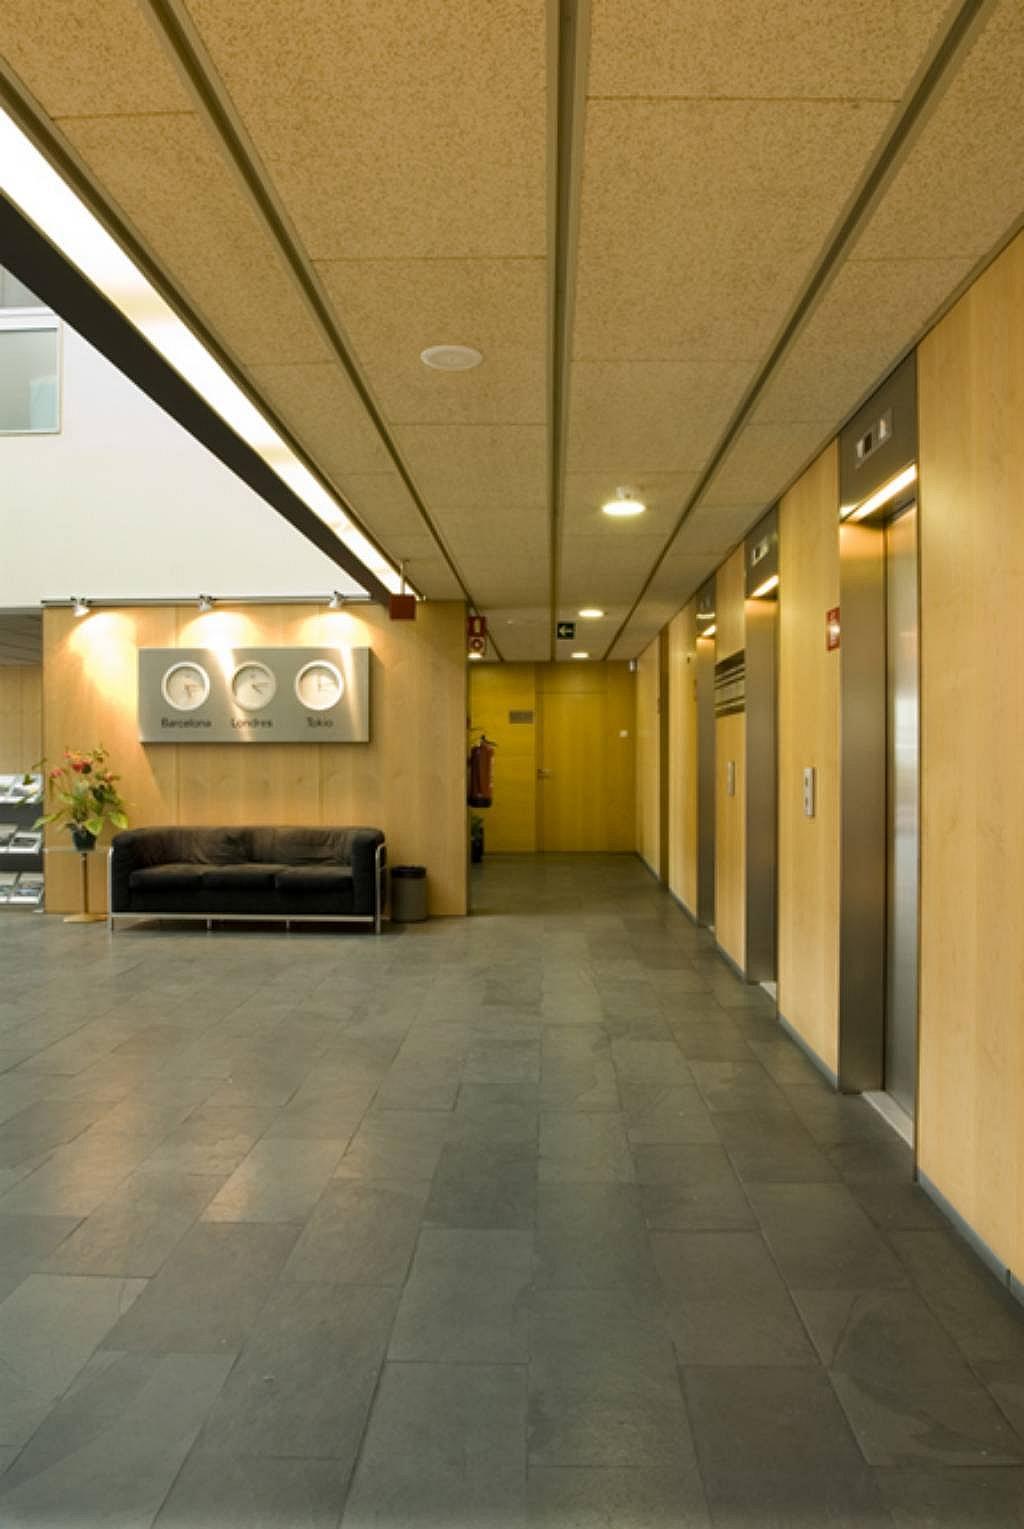 MuntadasII08[1] - Oficina en alquiler en calle Selva, Prat de Llobregat, El - 263449023